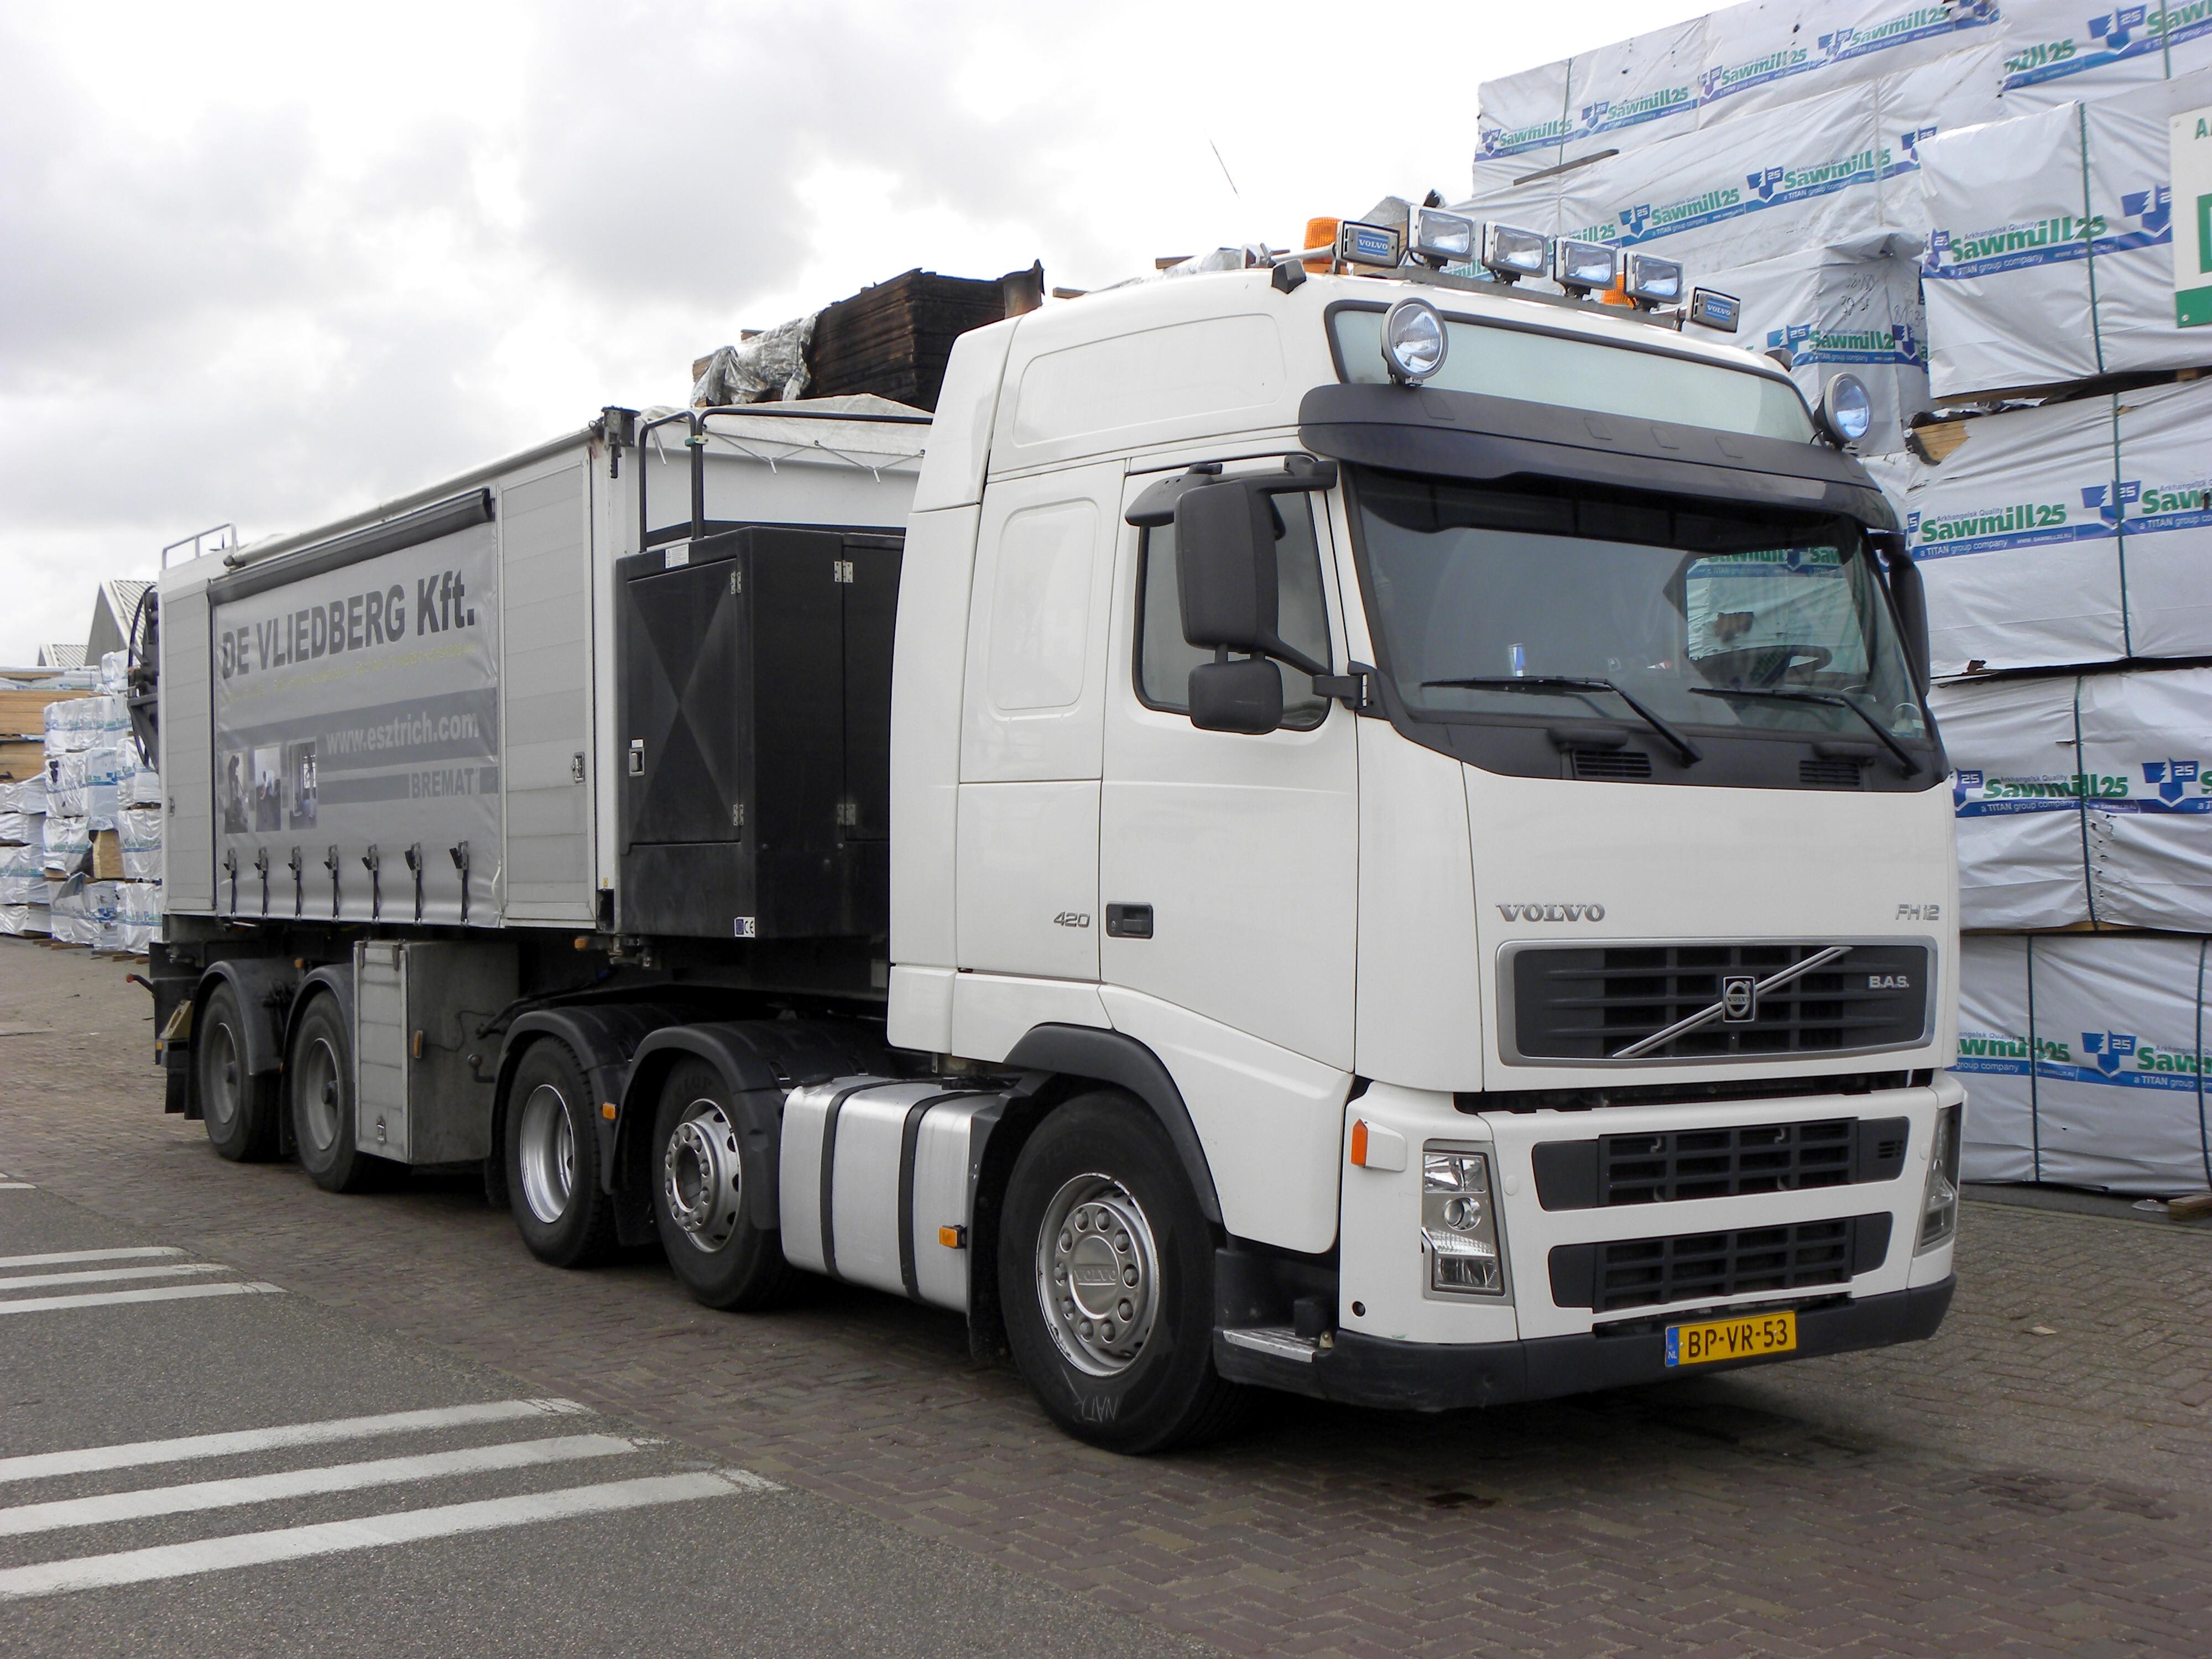 File:Volvo FH 12 420 de Vliedberg kft. - Flickr - Joost J ...